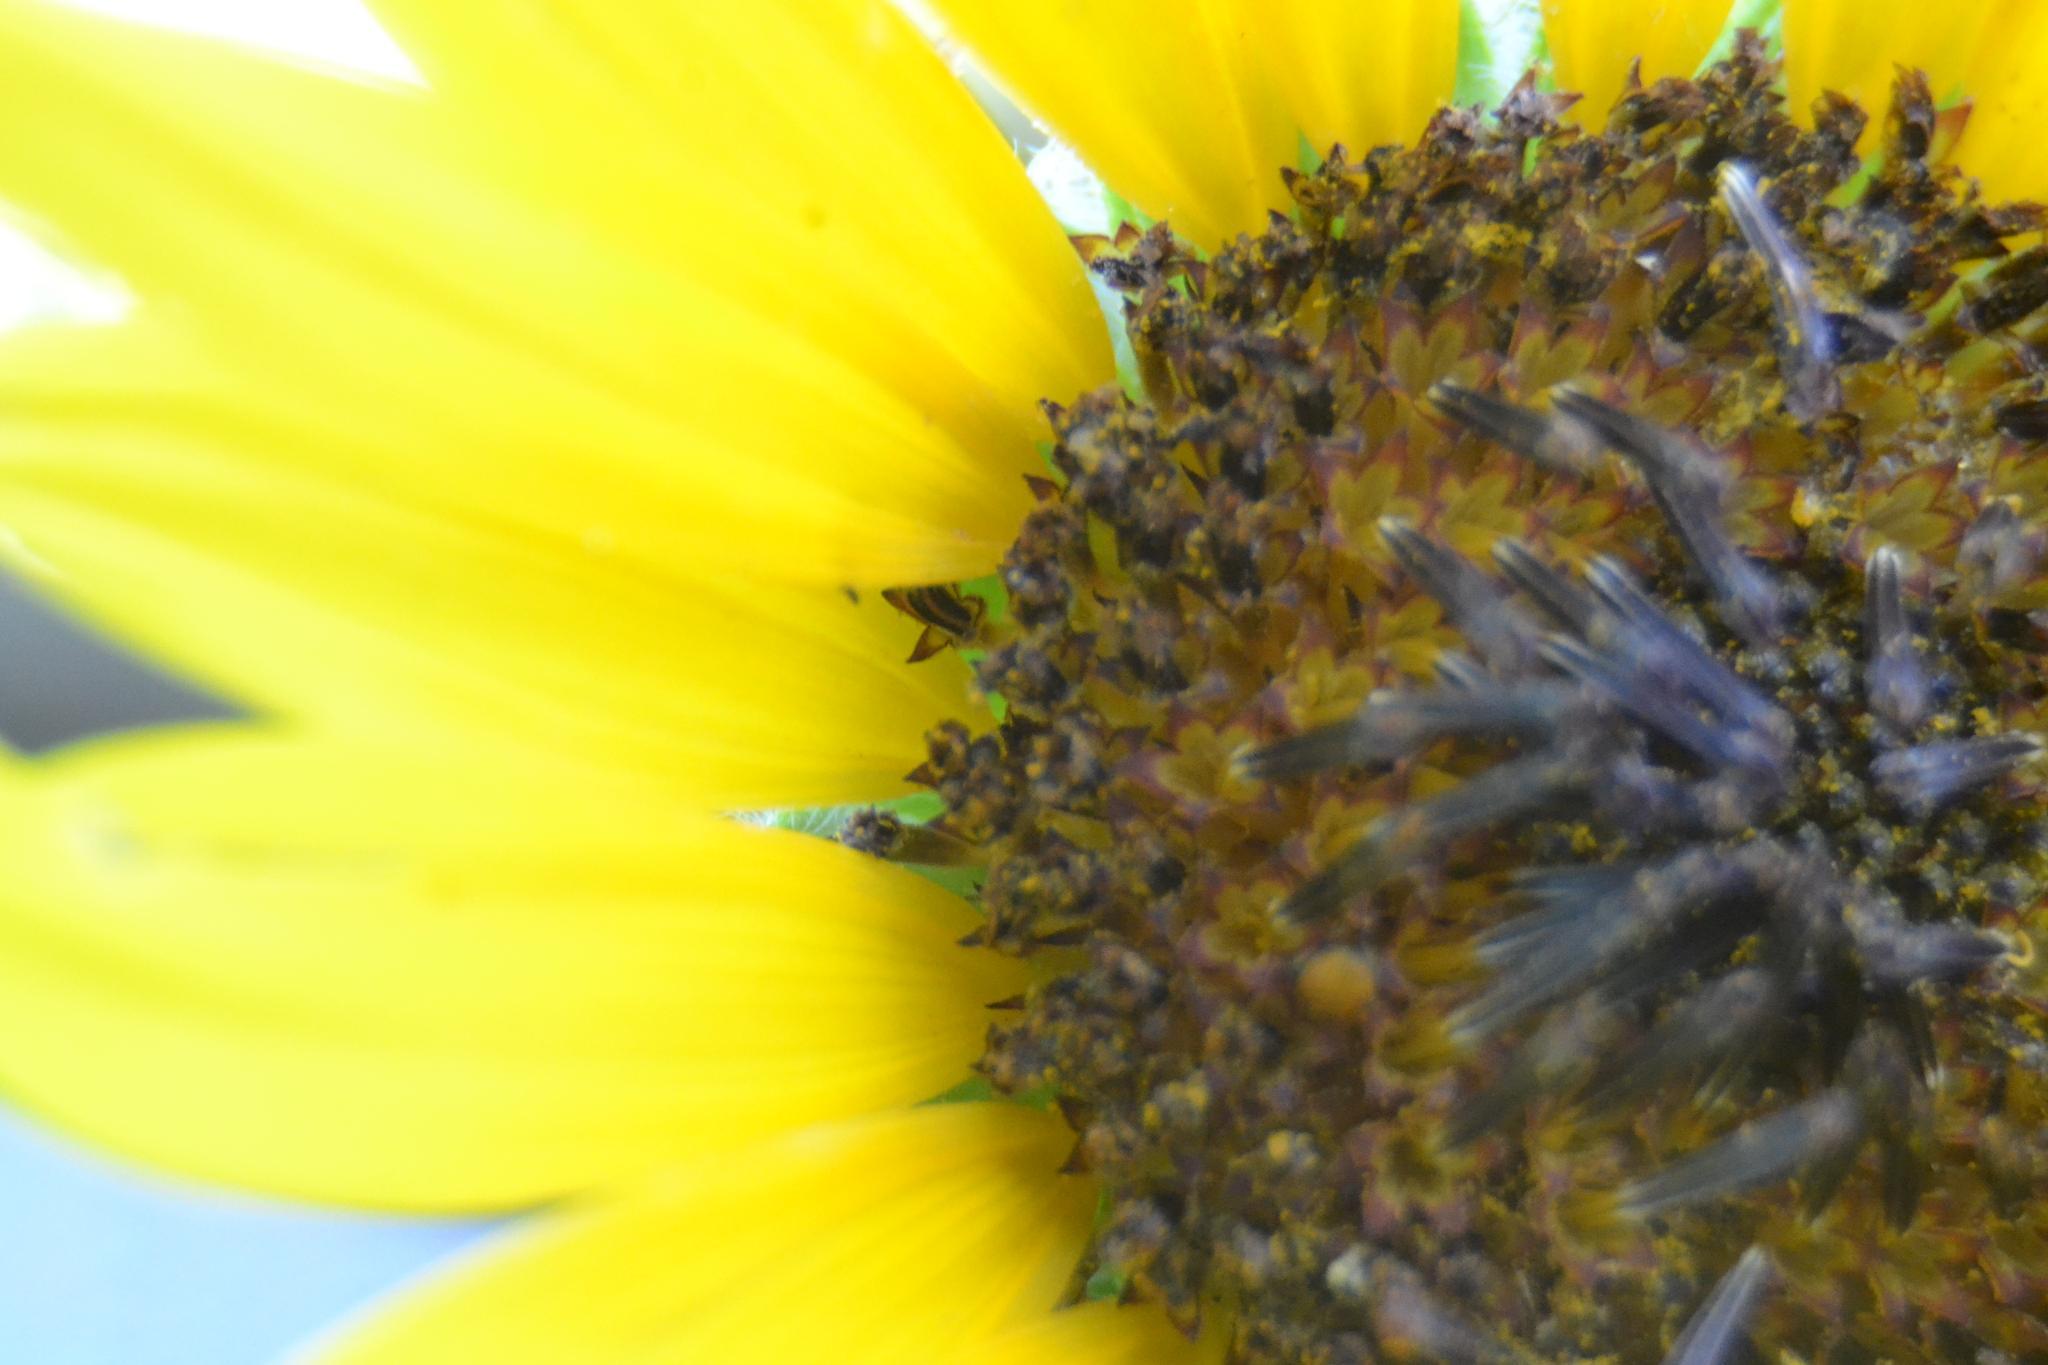 Sunflower by joshua.rich.399